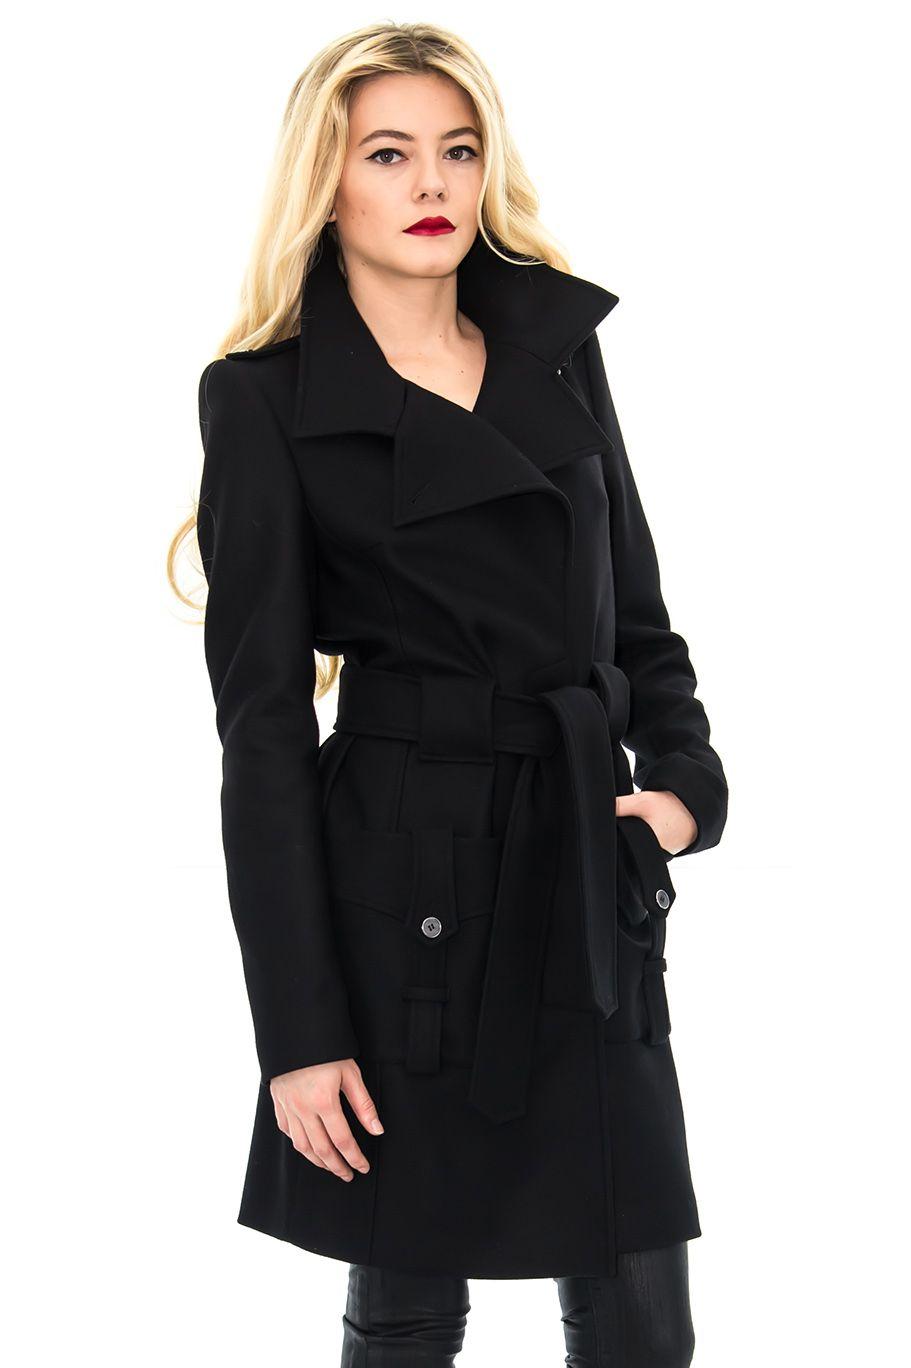 Manteau fourrure femme sisley